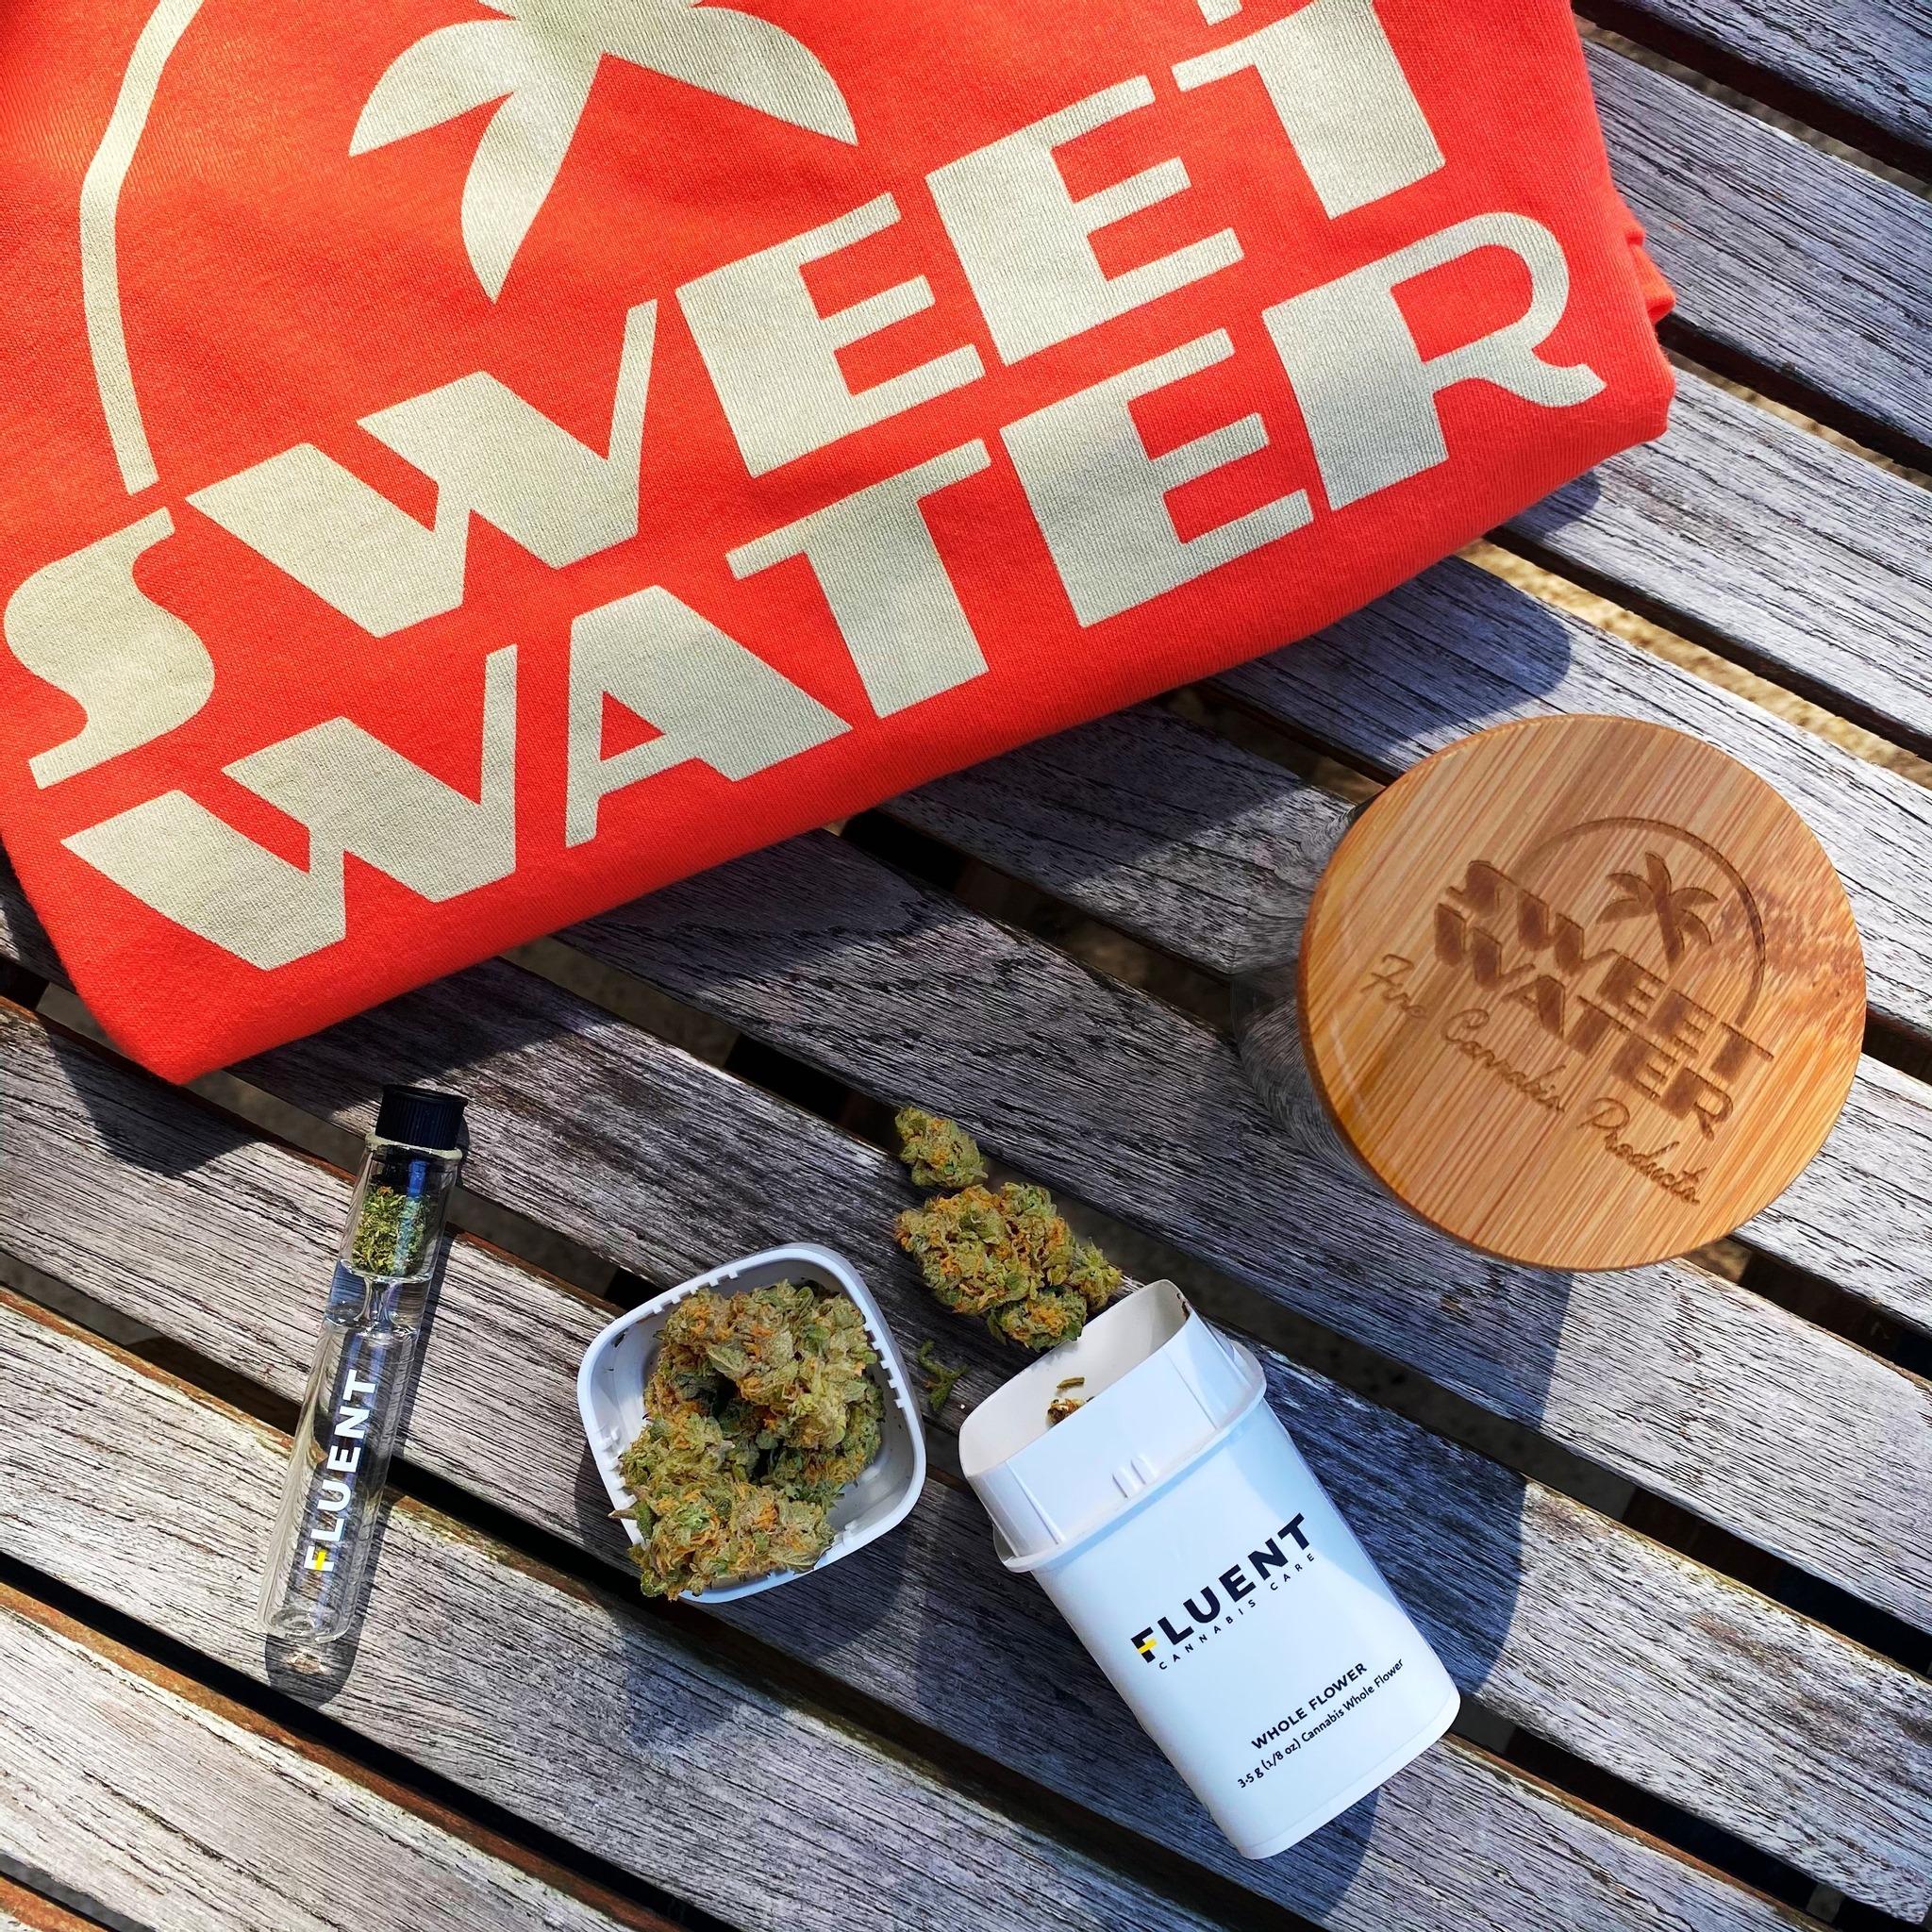 FLUENT Cannabis Dispensary - Coral Gables